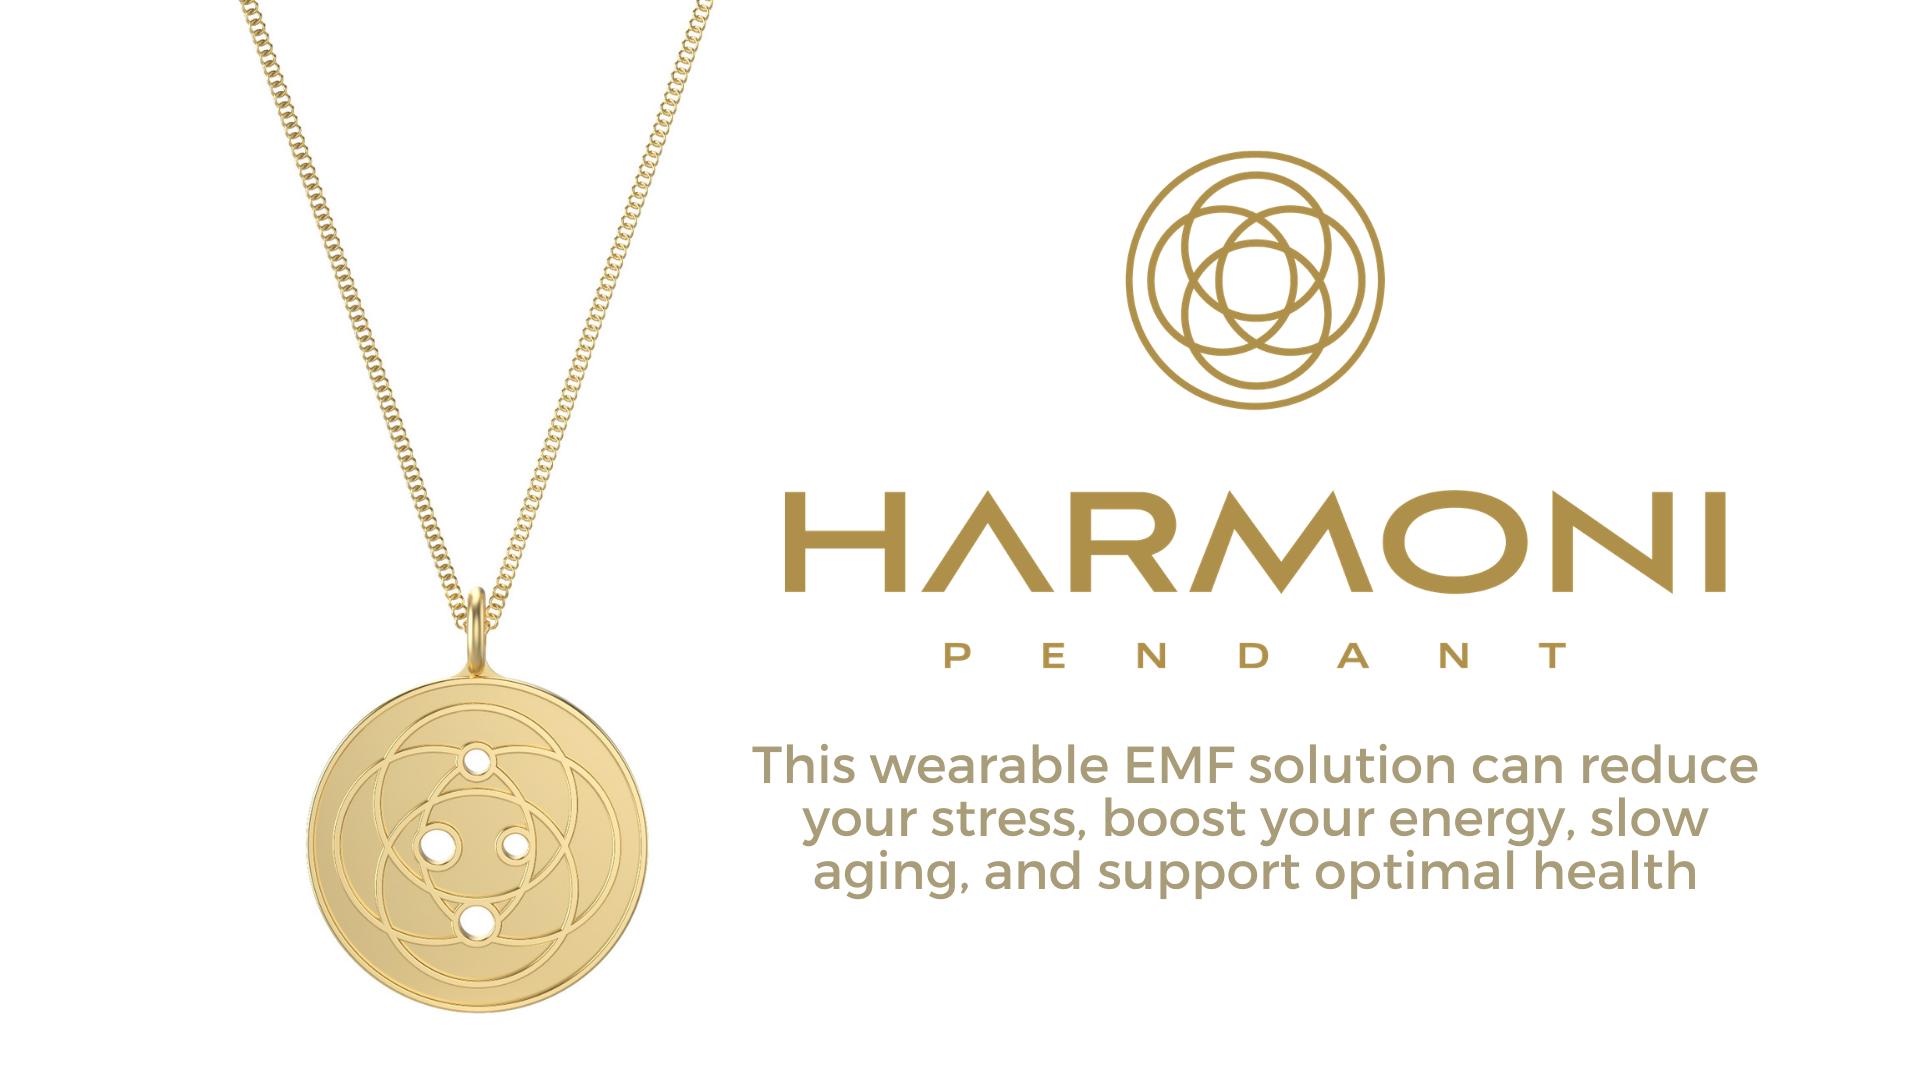 Harmoni Pendant